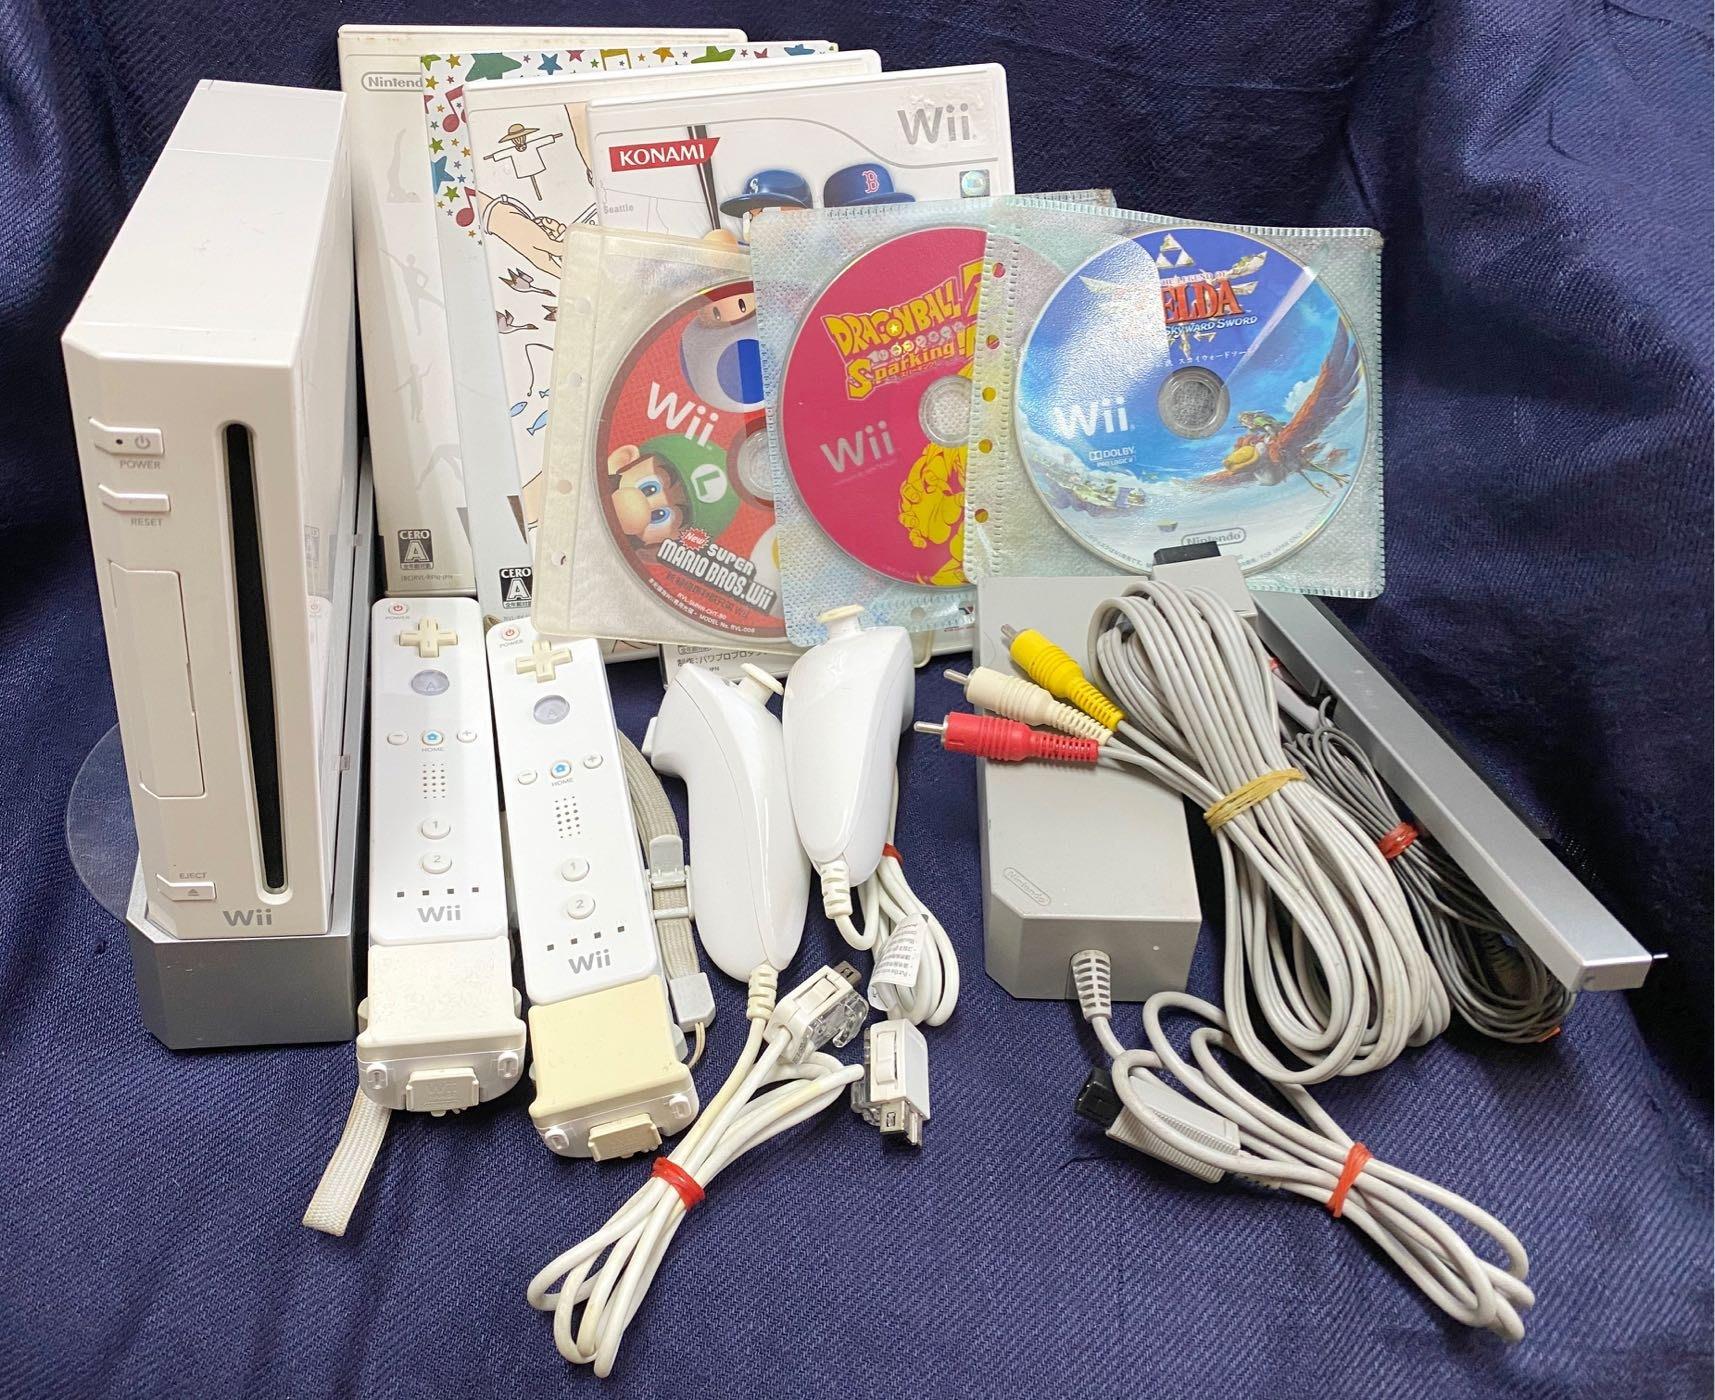 Nintendo Wii 主機(4.3J 無改機、日規機RVL-001)、原廠手把(動感強化器)*2組、原廠遊戲*7